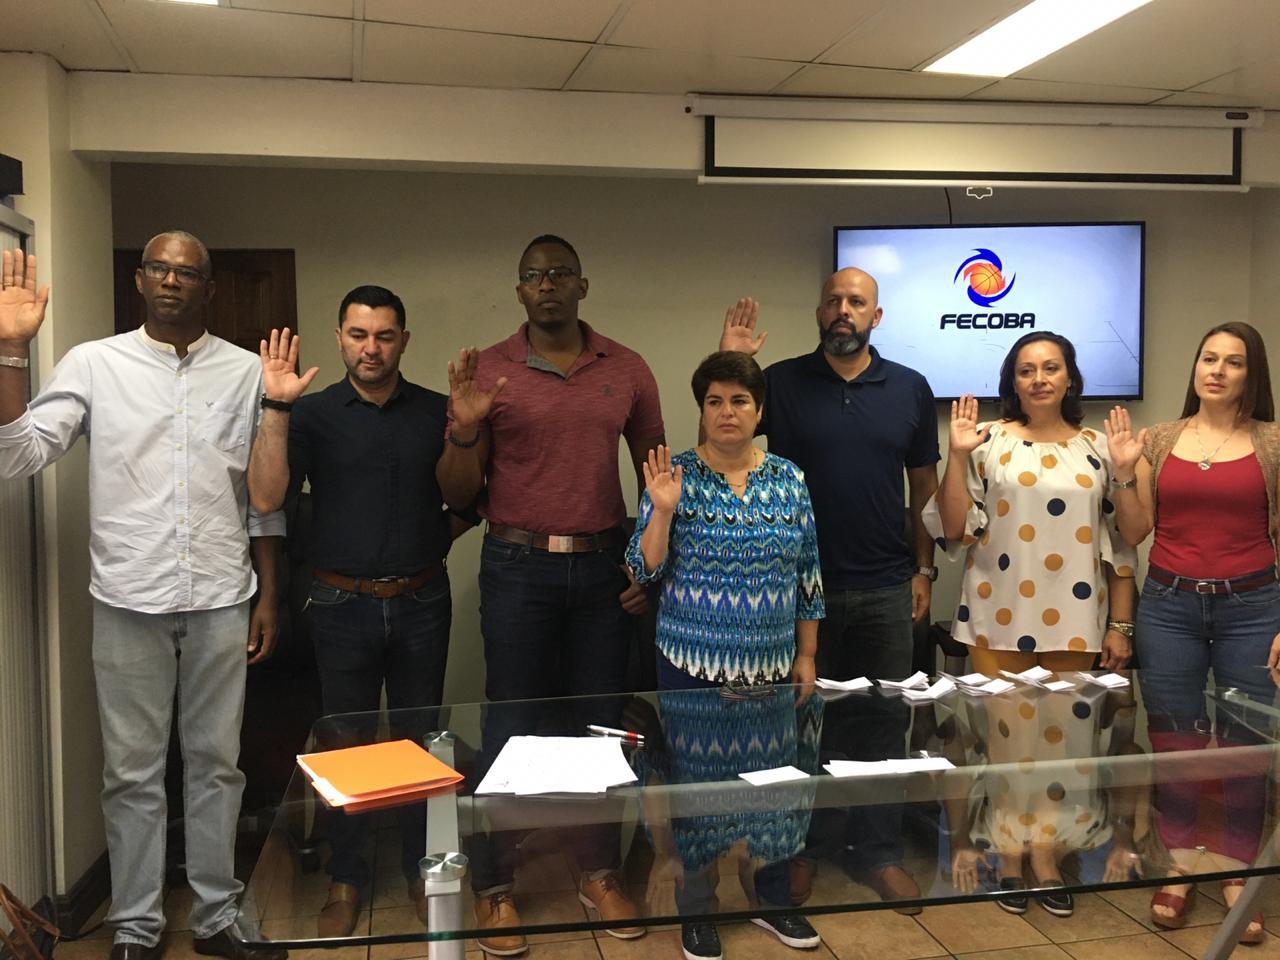 Asamblea General nombró Comité Ejecutivo de la Federación Costarricense de Baloncesto.